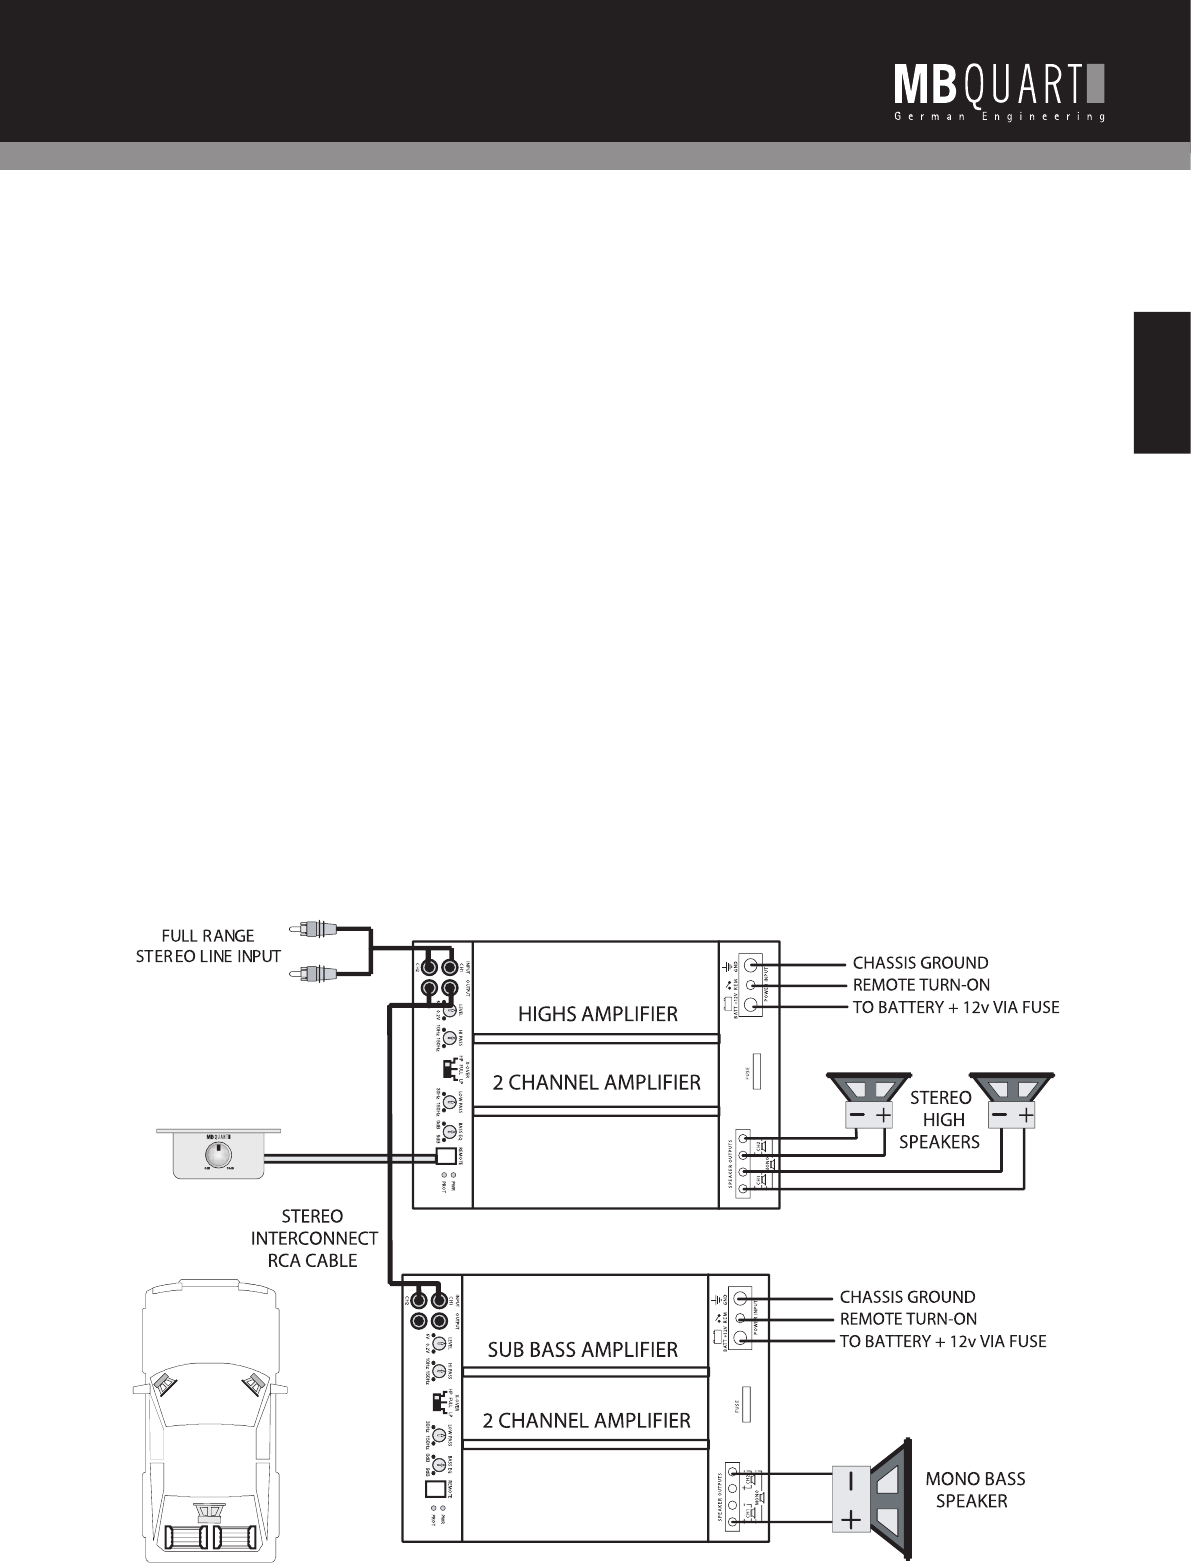 Handleiding Mb Quart Pab 5400 Pagina 7 Van 88 Deutsch English Espanol Francais